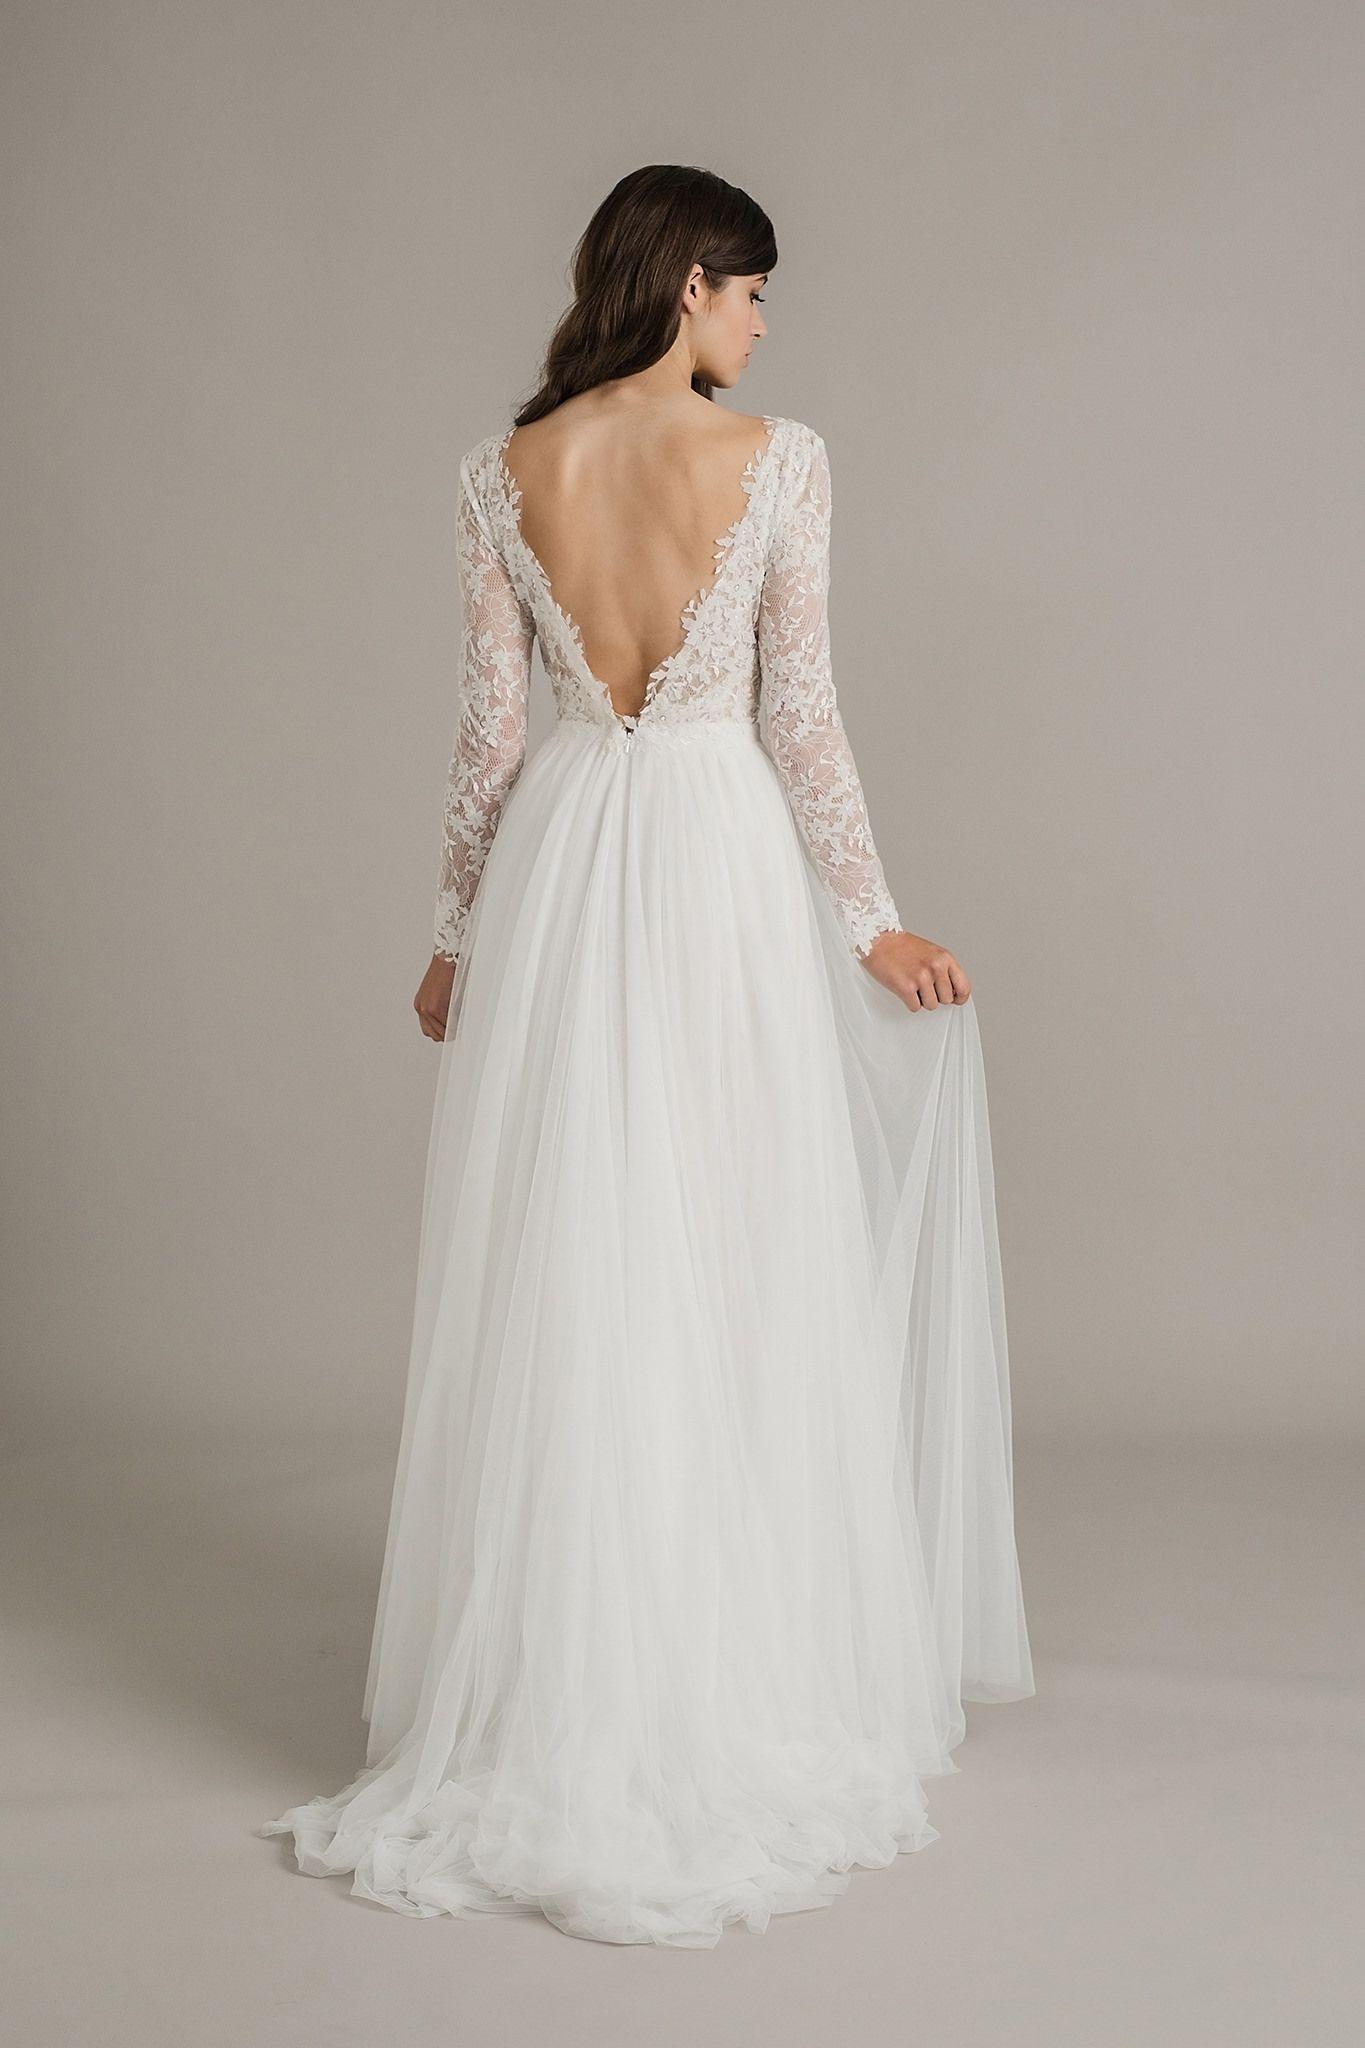 DUSK The Stunning Sally Eagle 2017 Wedding Collection Dress